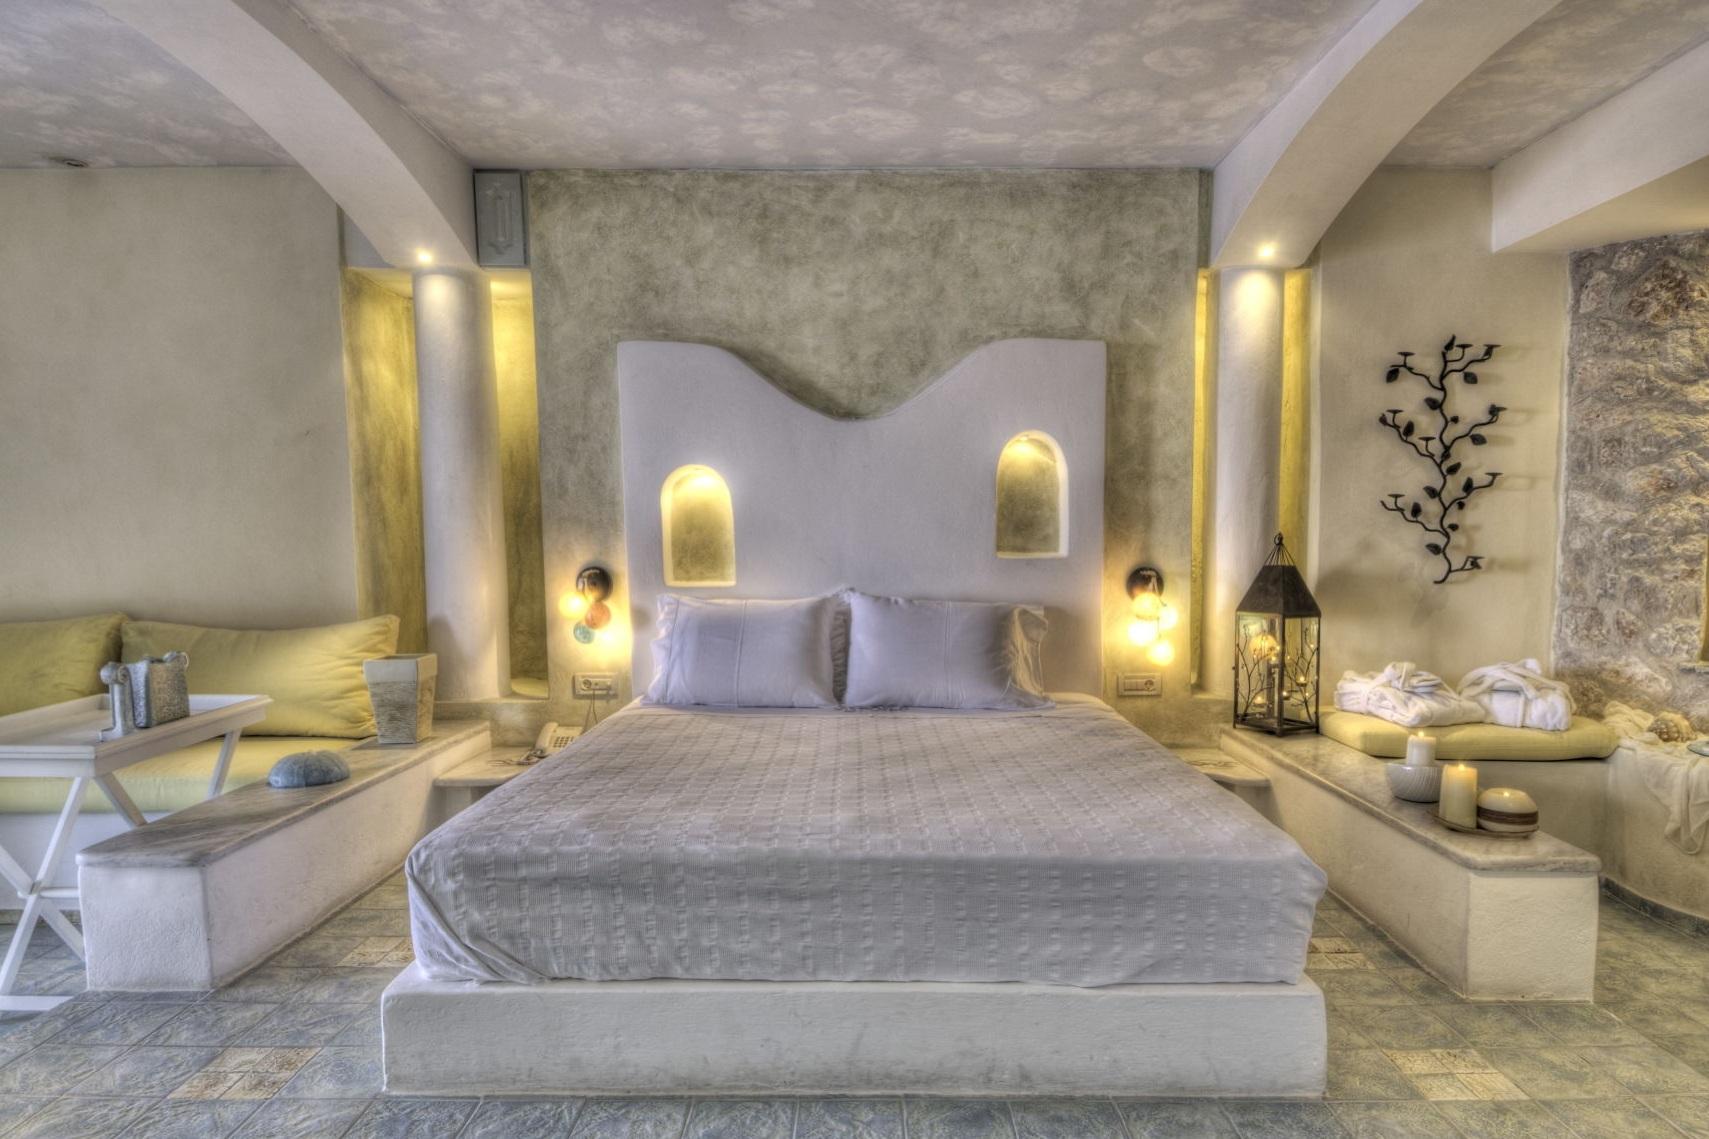 5_Honeymoon_suite_private_couples_Jacuzzi_sea_volcano_caldera_views_Astarte_Suites_Santorini_island.jpg